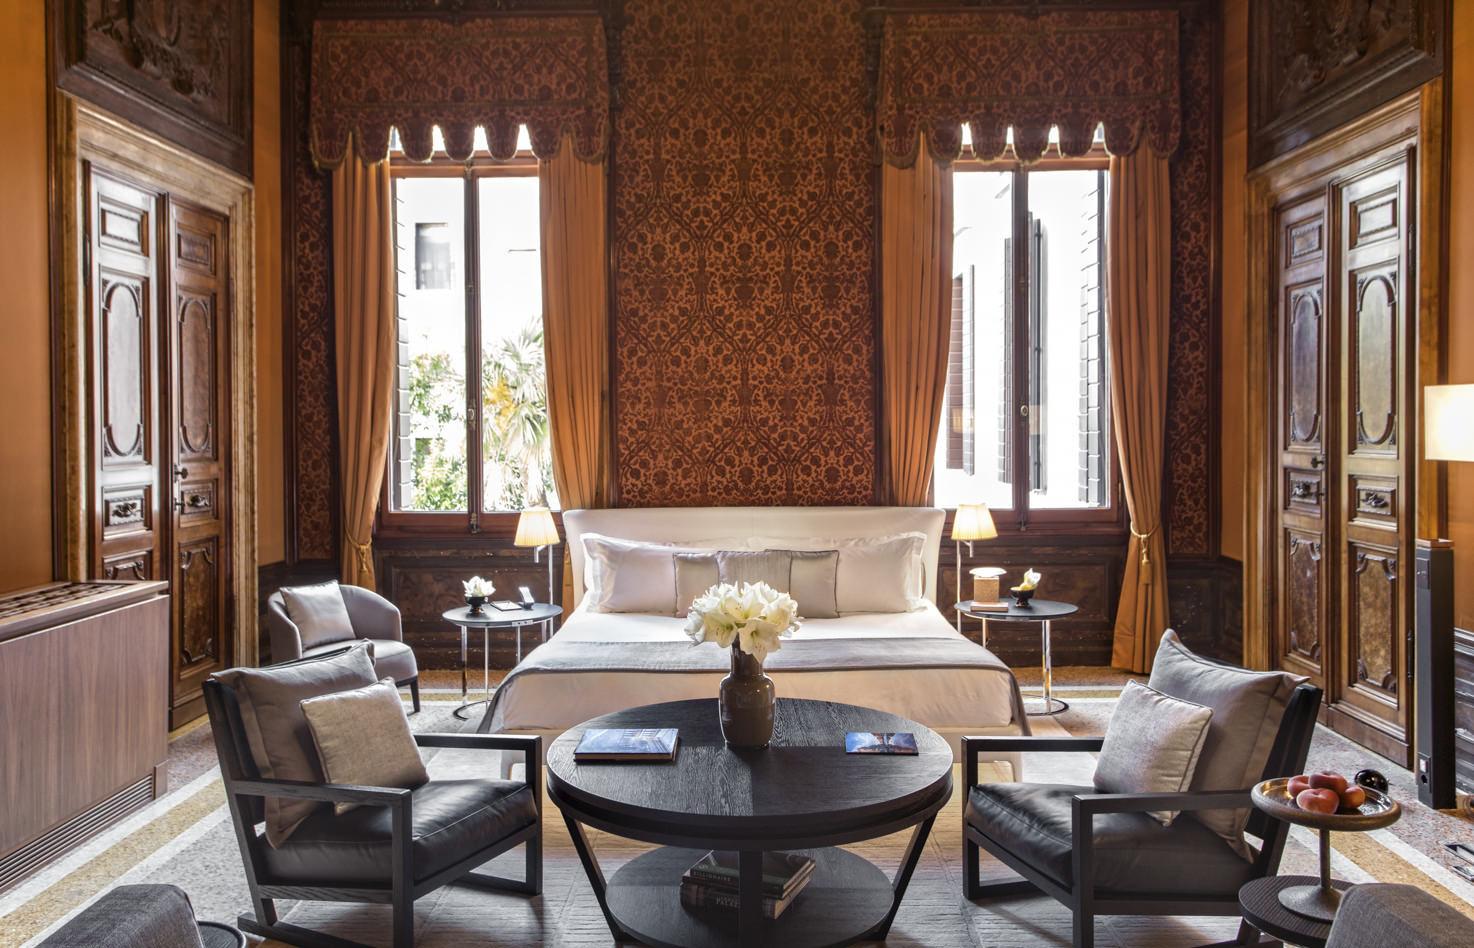 Suite Sansovino at Aman Hotel